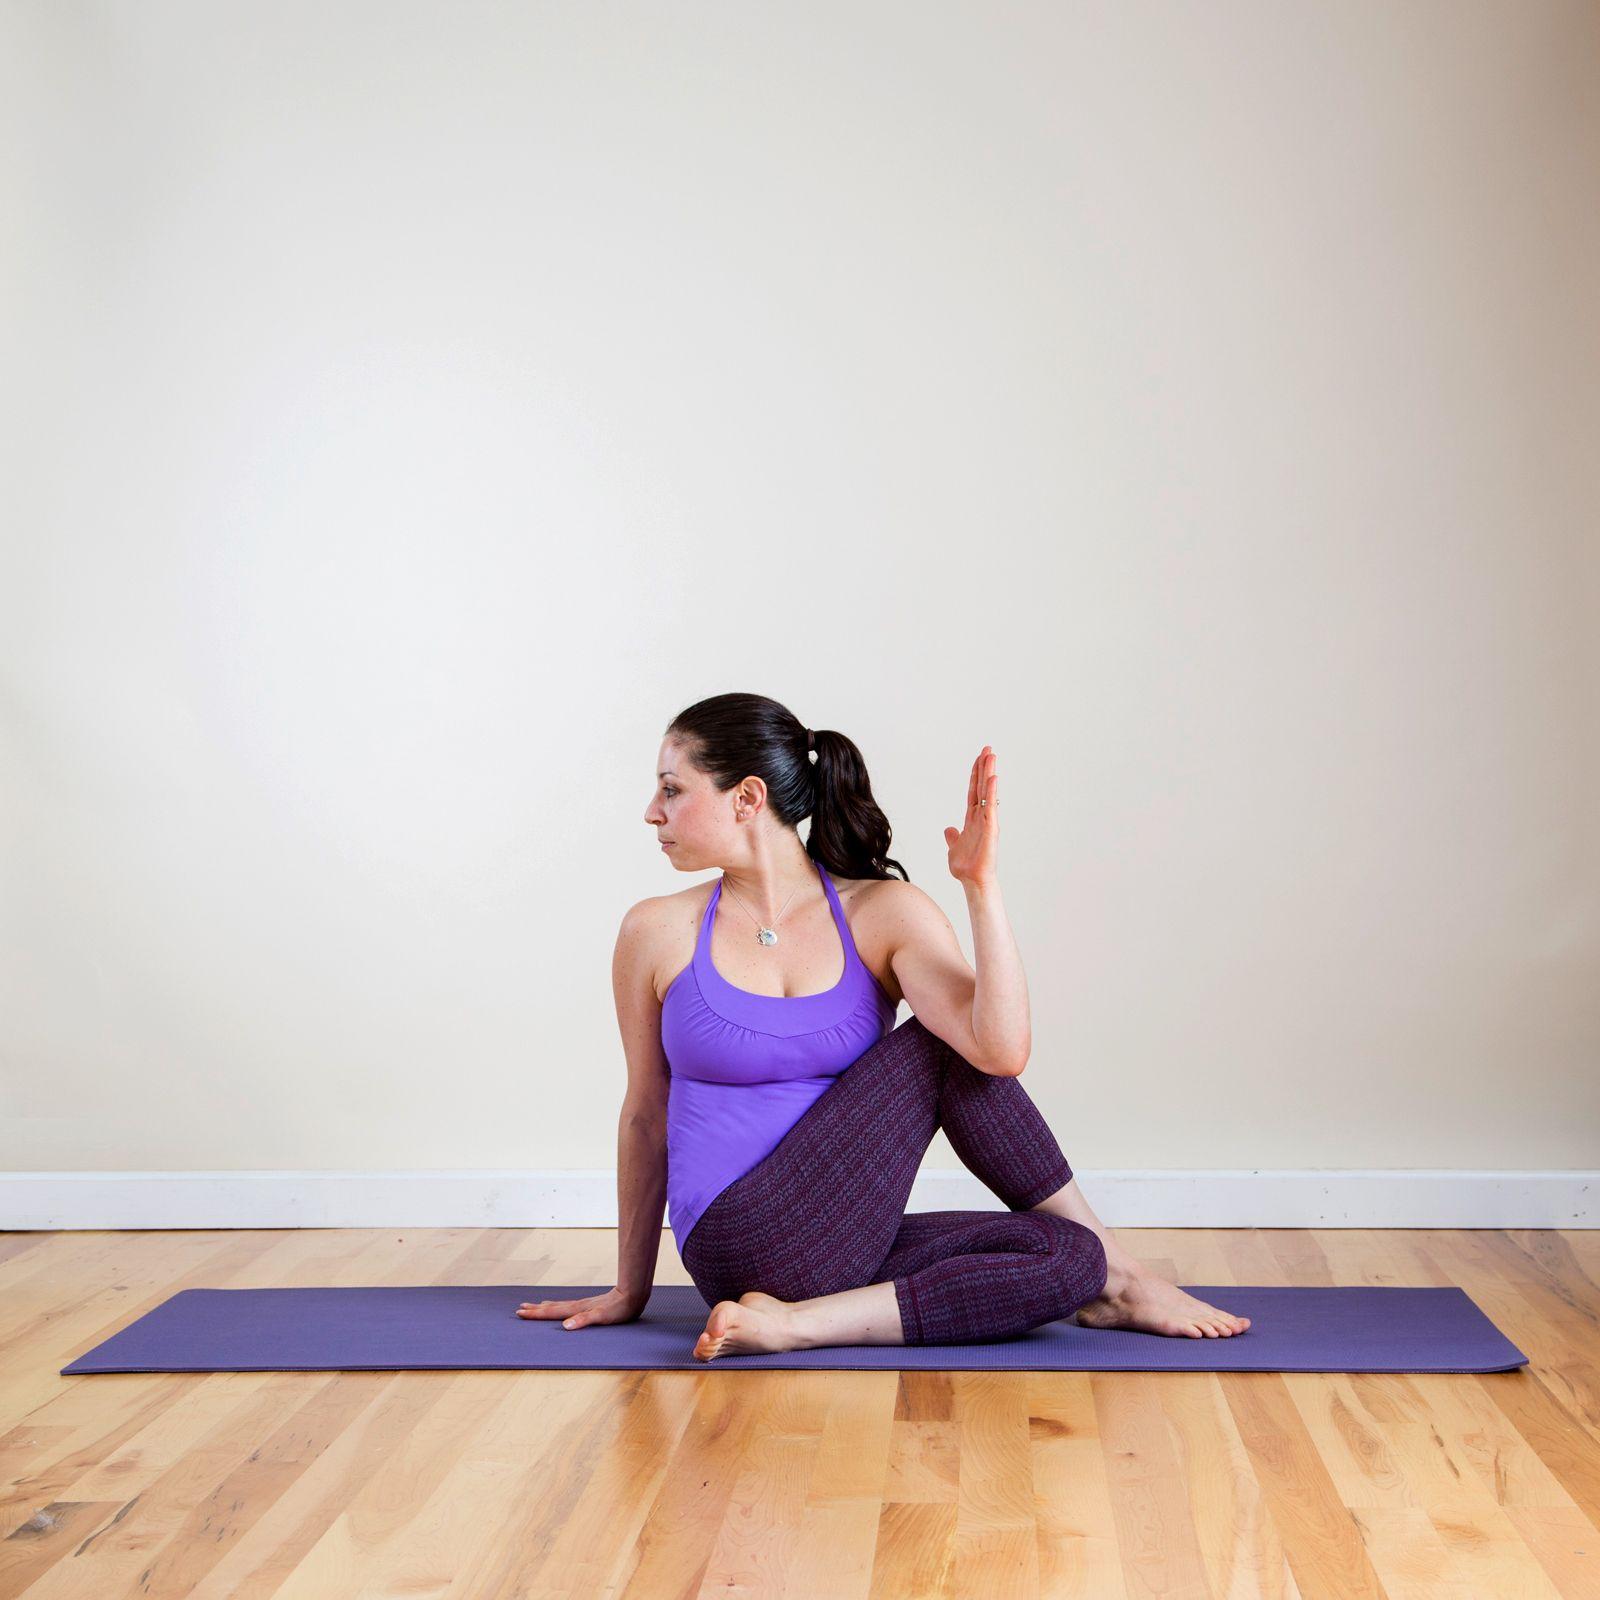 ho helped bring yoga - HD1600×1600